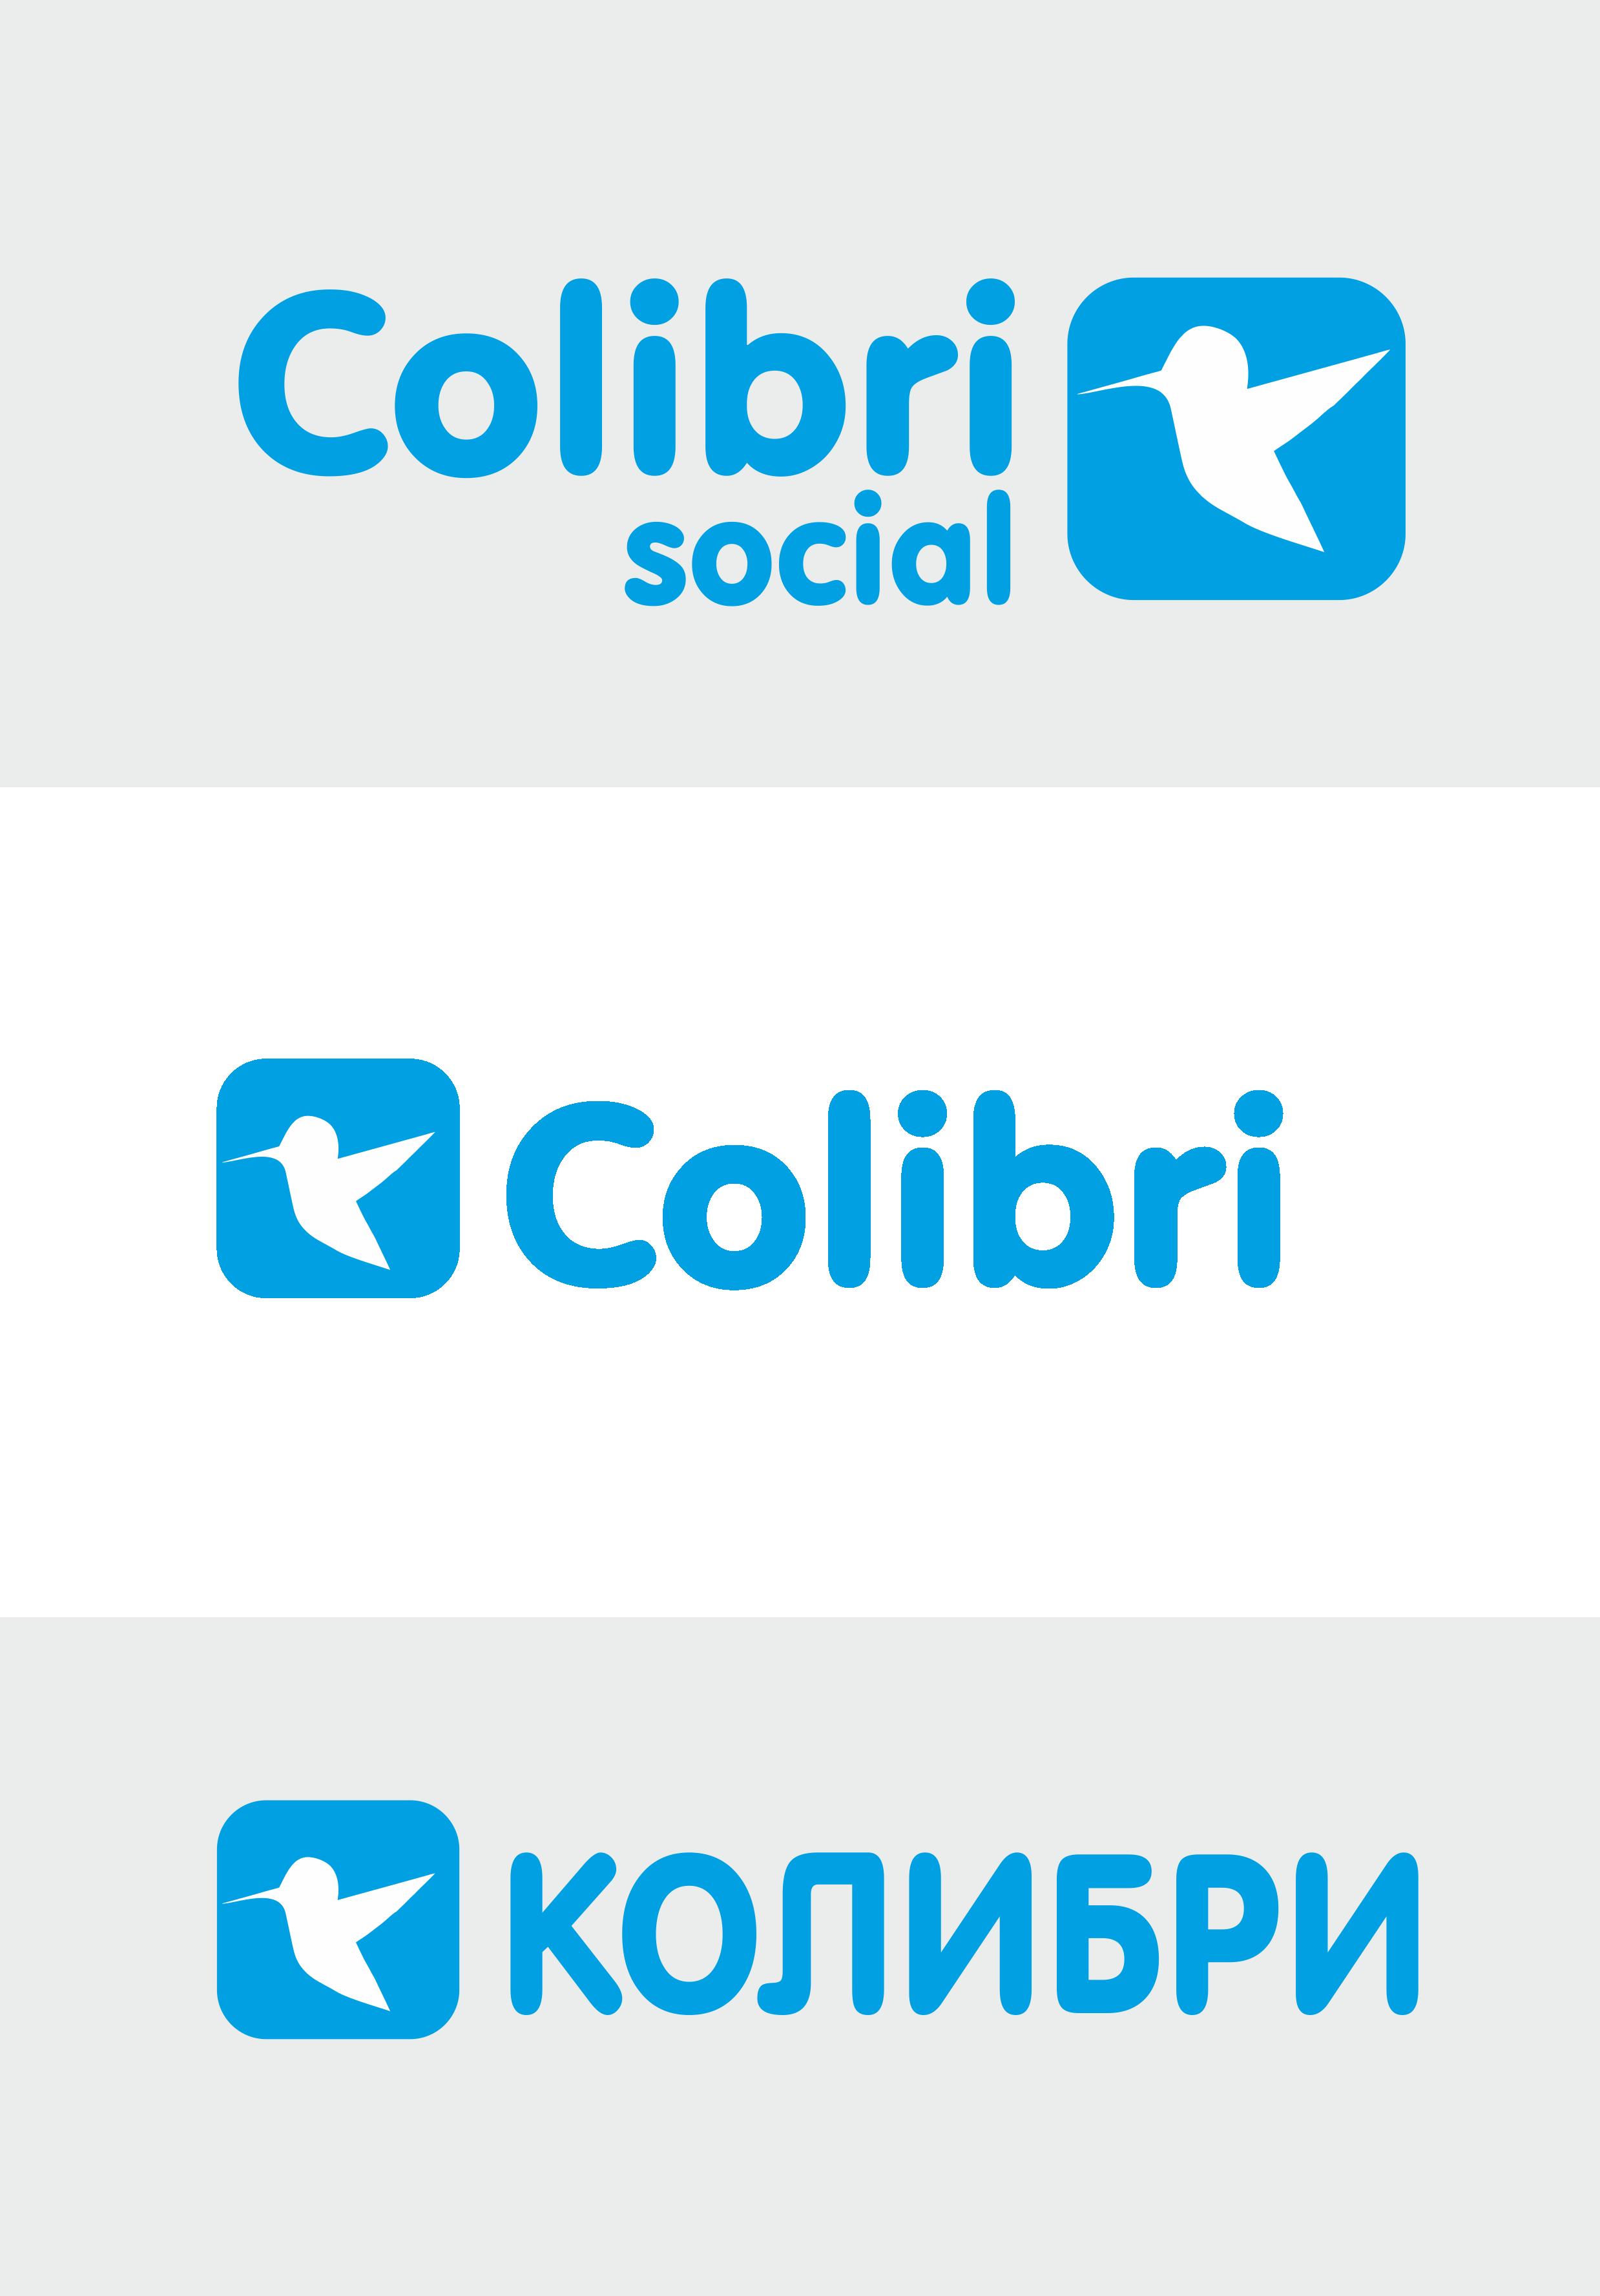 Дизайнер, разработка логотипа компании фото f_634558081fb78af9.png